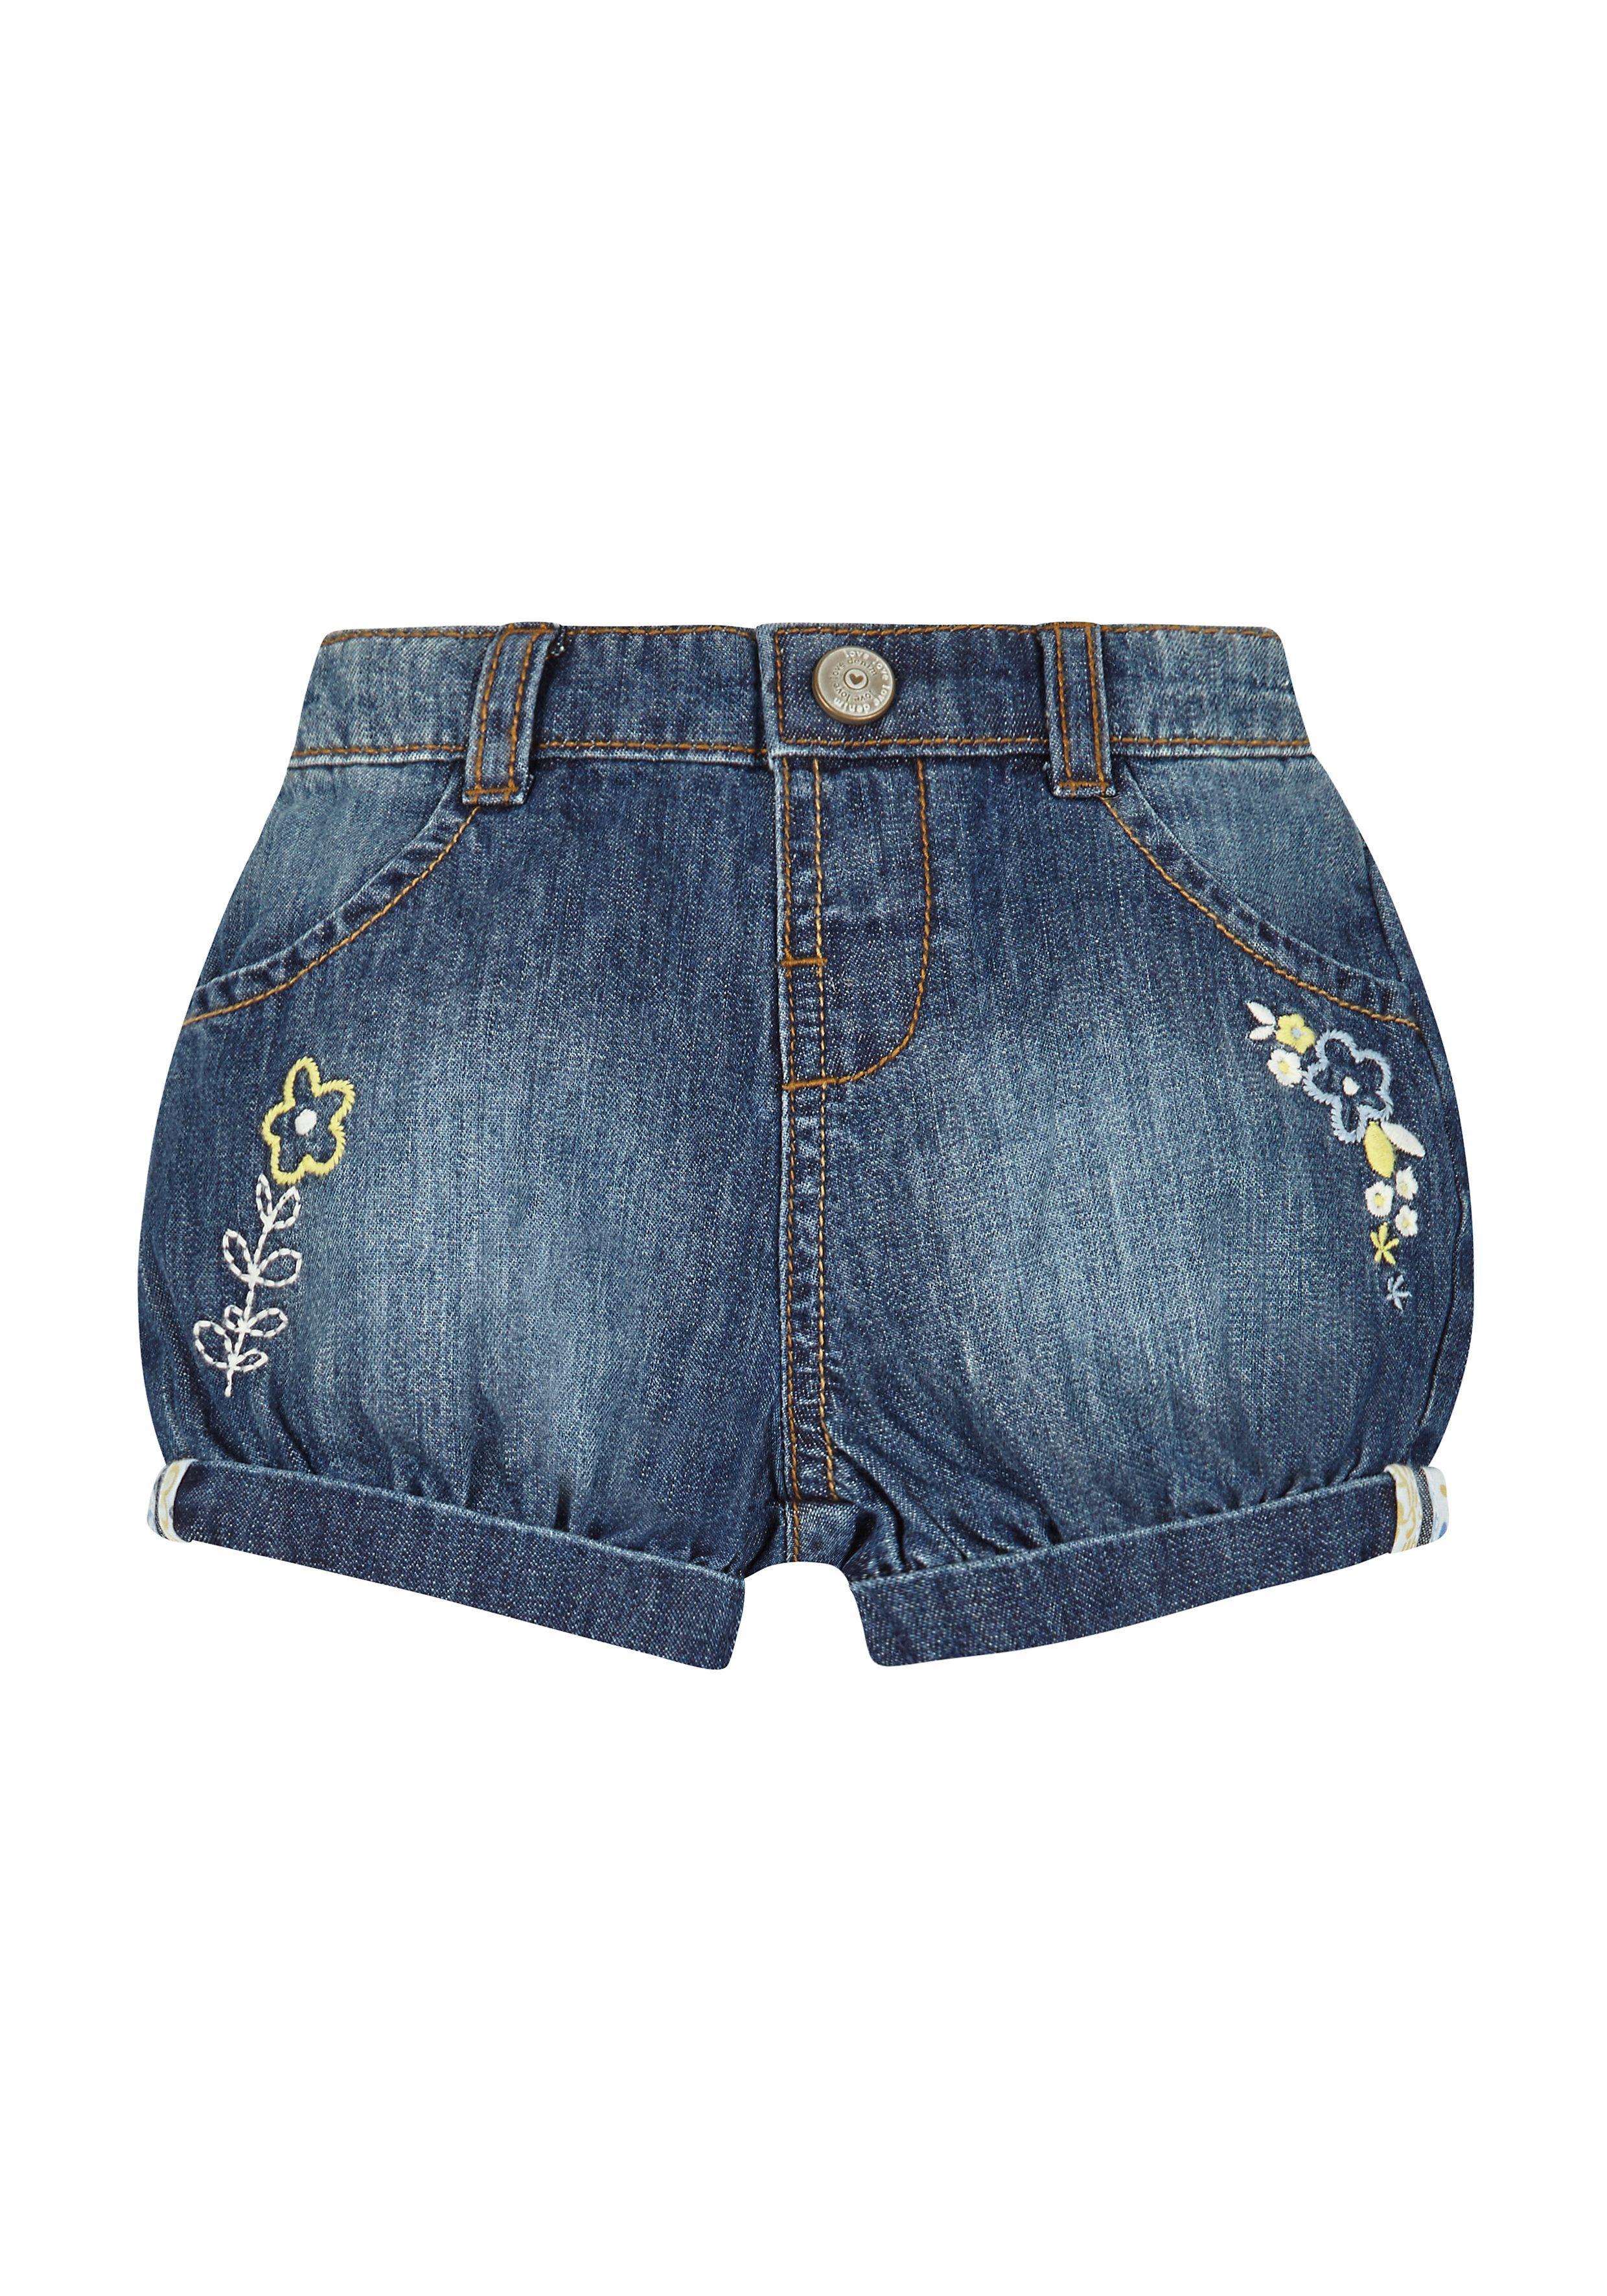 Mothercare   Girls Denim Shorts - Blue